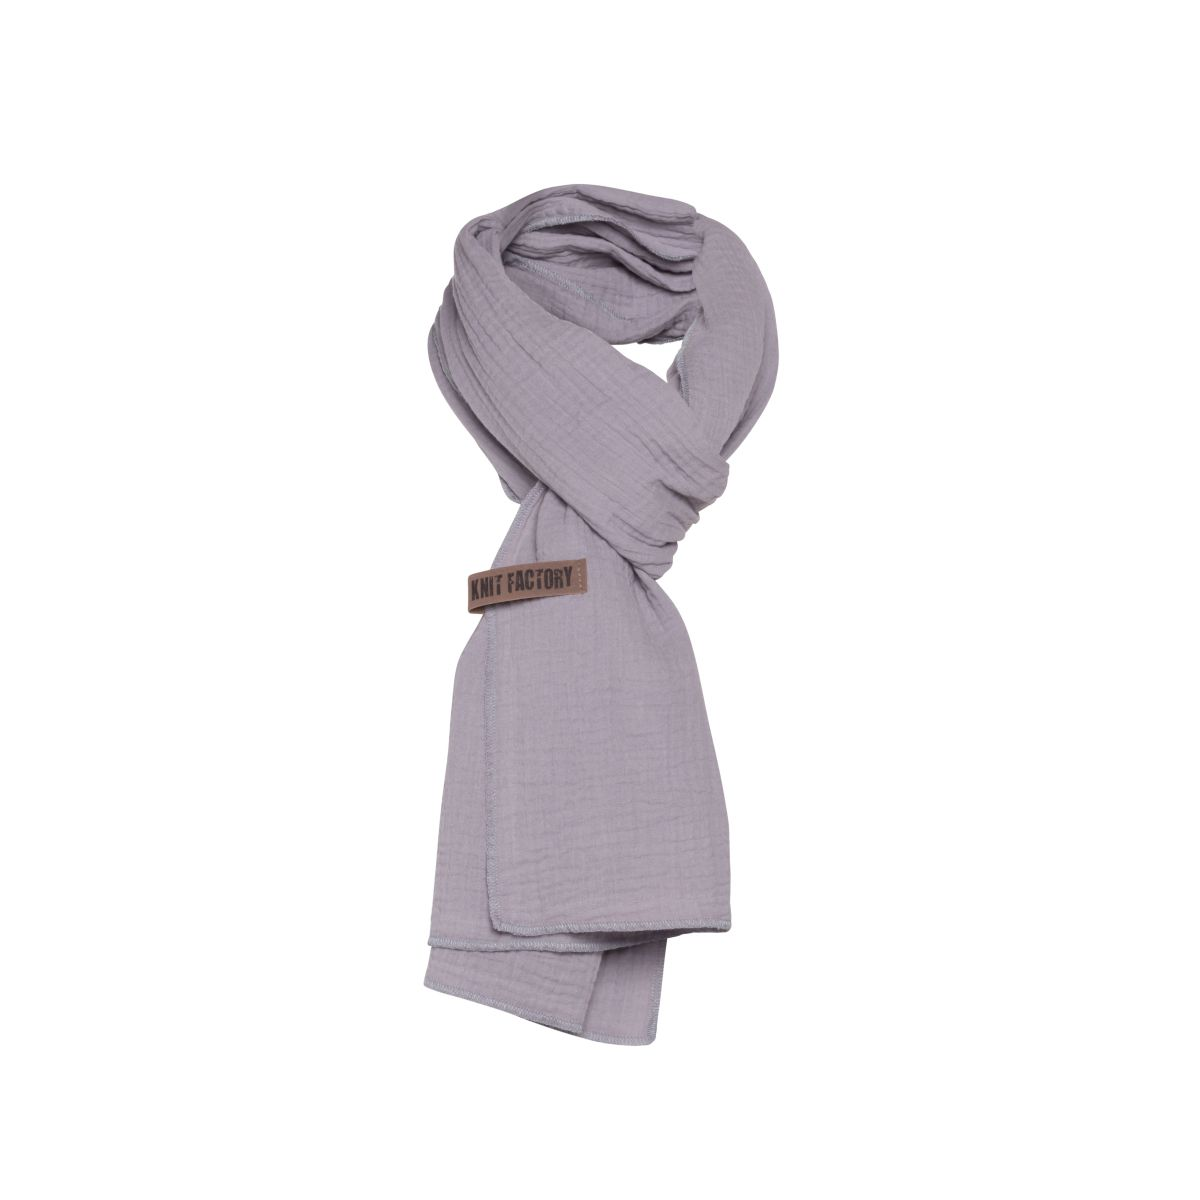 knit factory 1286511 liv sjaal grijs 2